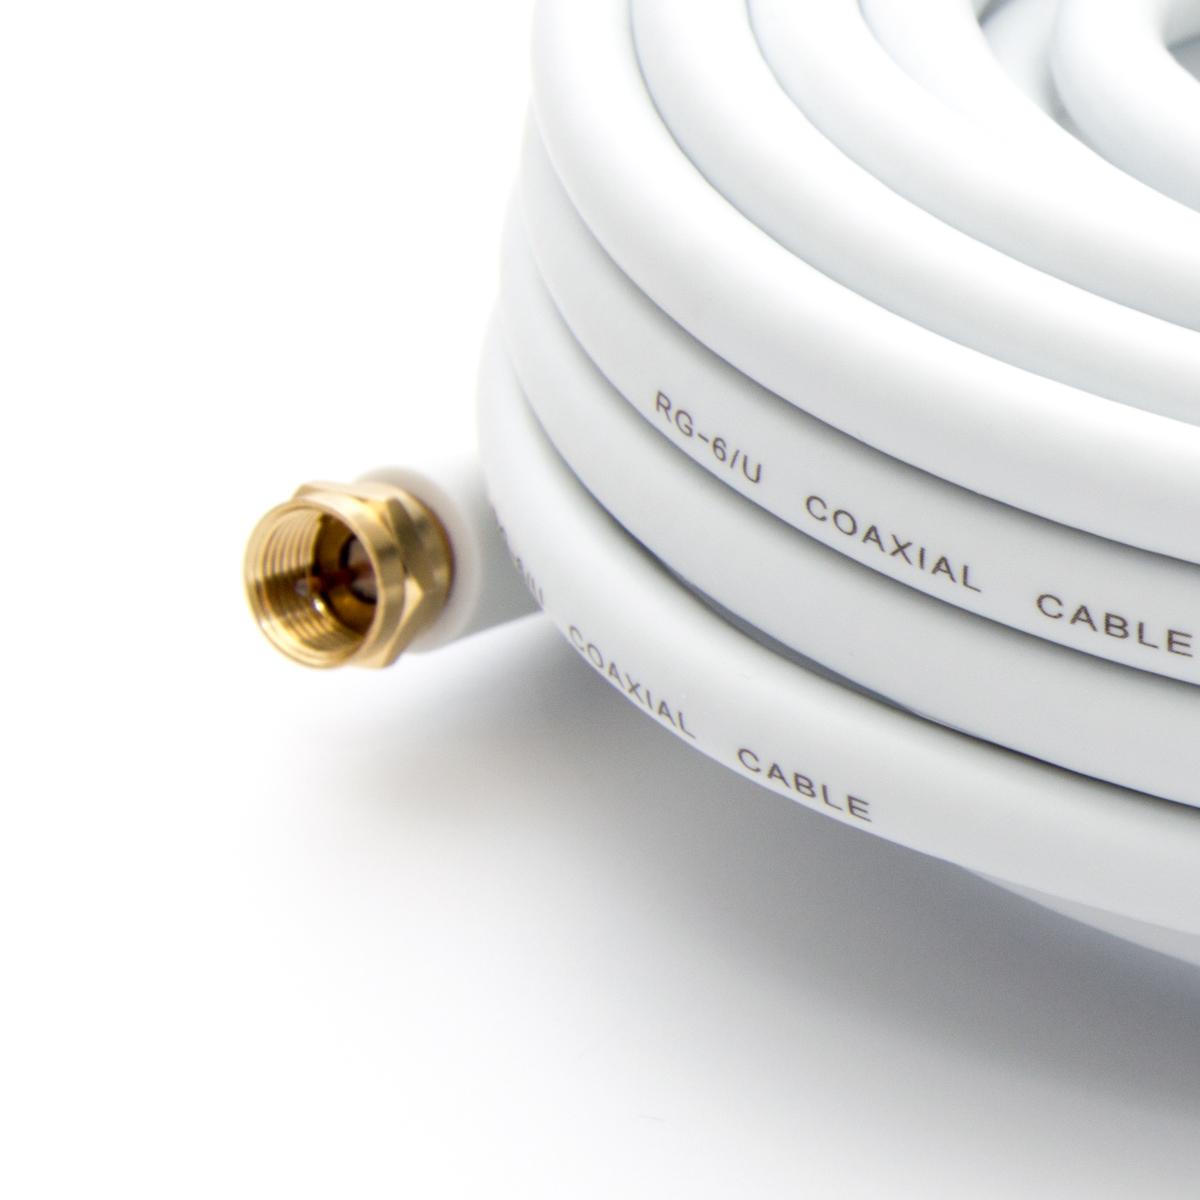 20m PremiumX HDTV Sat Antennenkabel Koax Kabel vergoldet 75 Ohm Koaxialkabel für Sat-Anlage DVB-S DVB-S2 DVB-T DVB-T2 mit Mantelstromfilter – 2x Ferritkern – Weiß